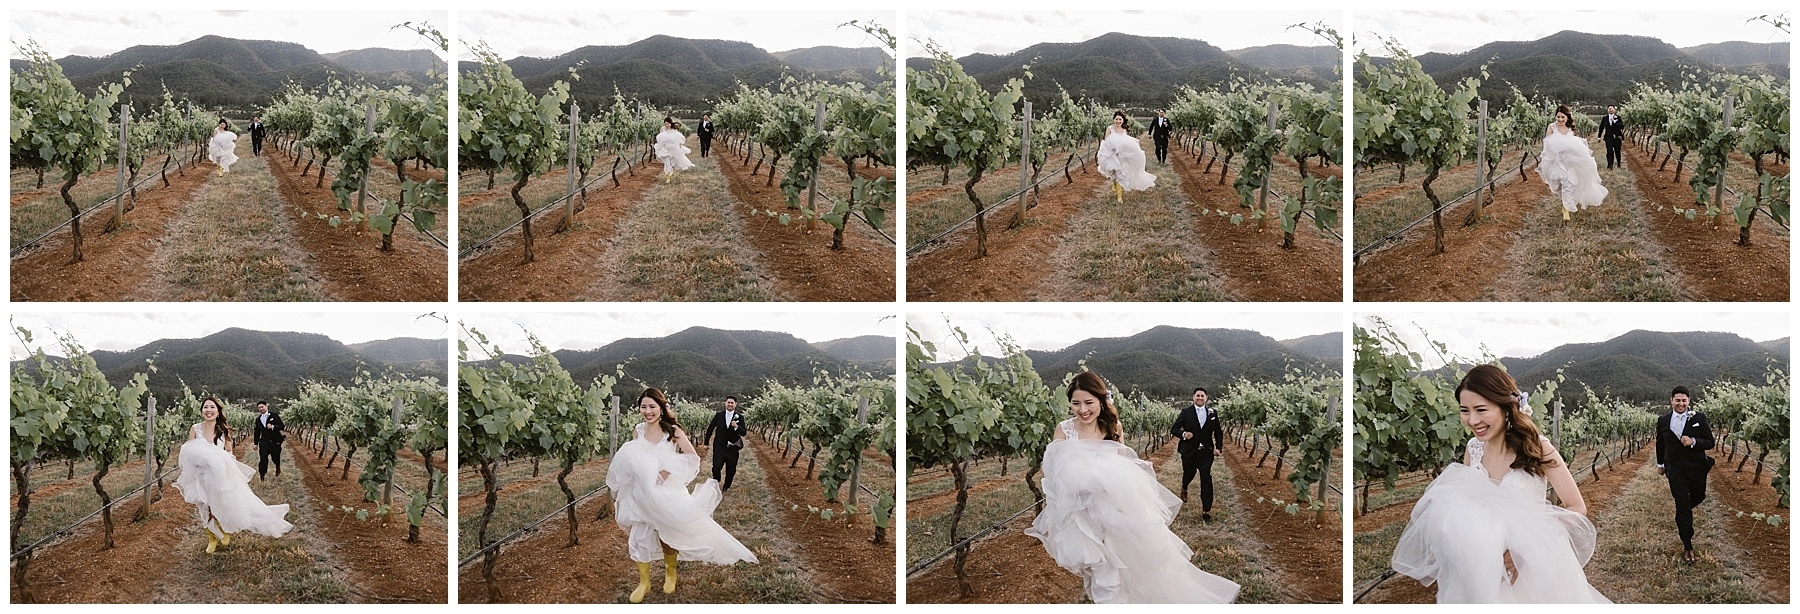 AUDREY WILKING COCKFIGHTERS GHOST Wedding Photographer_0044.jpg